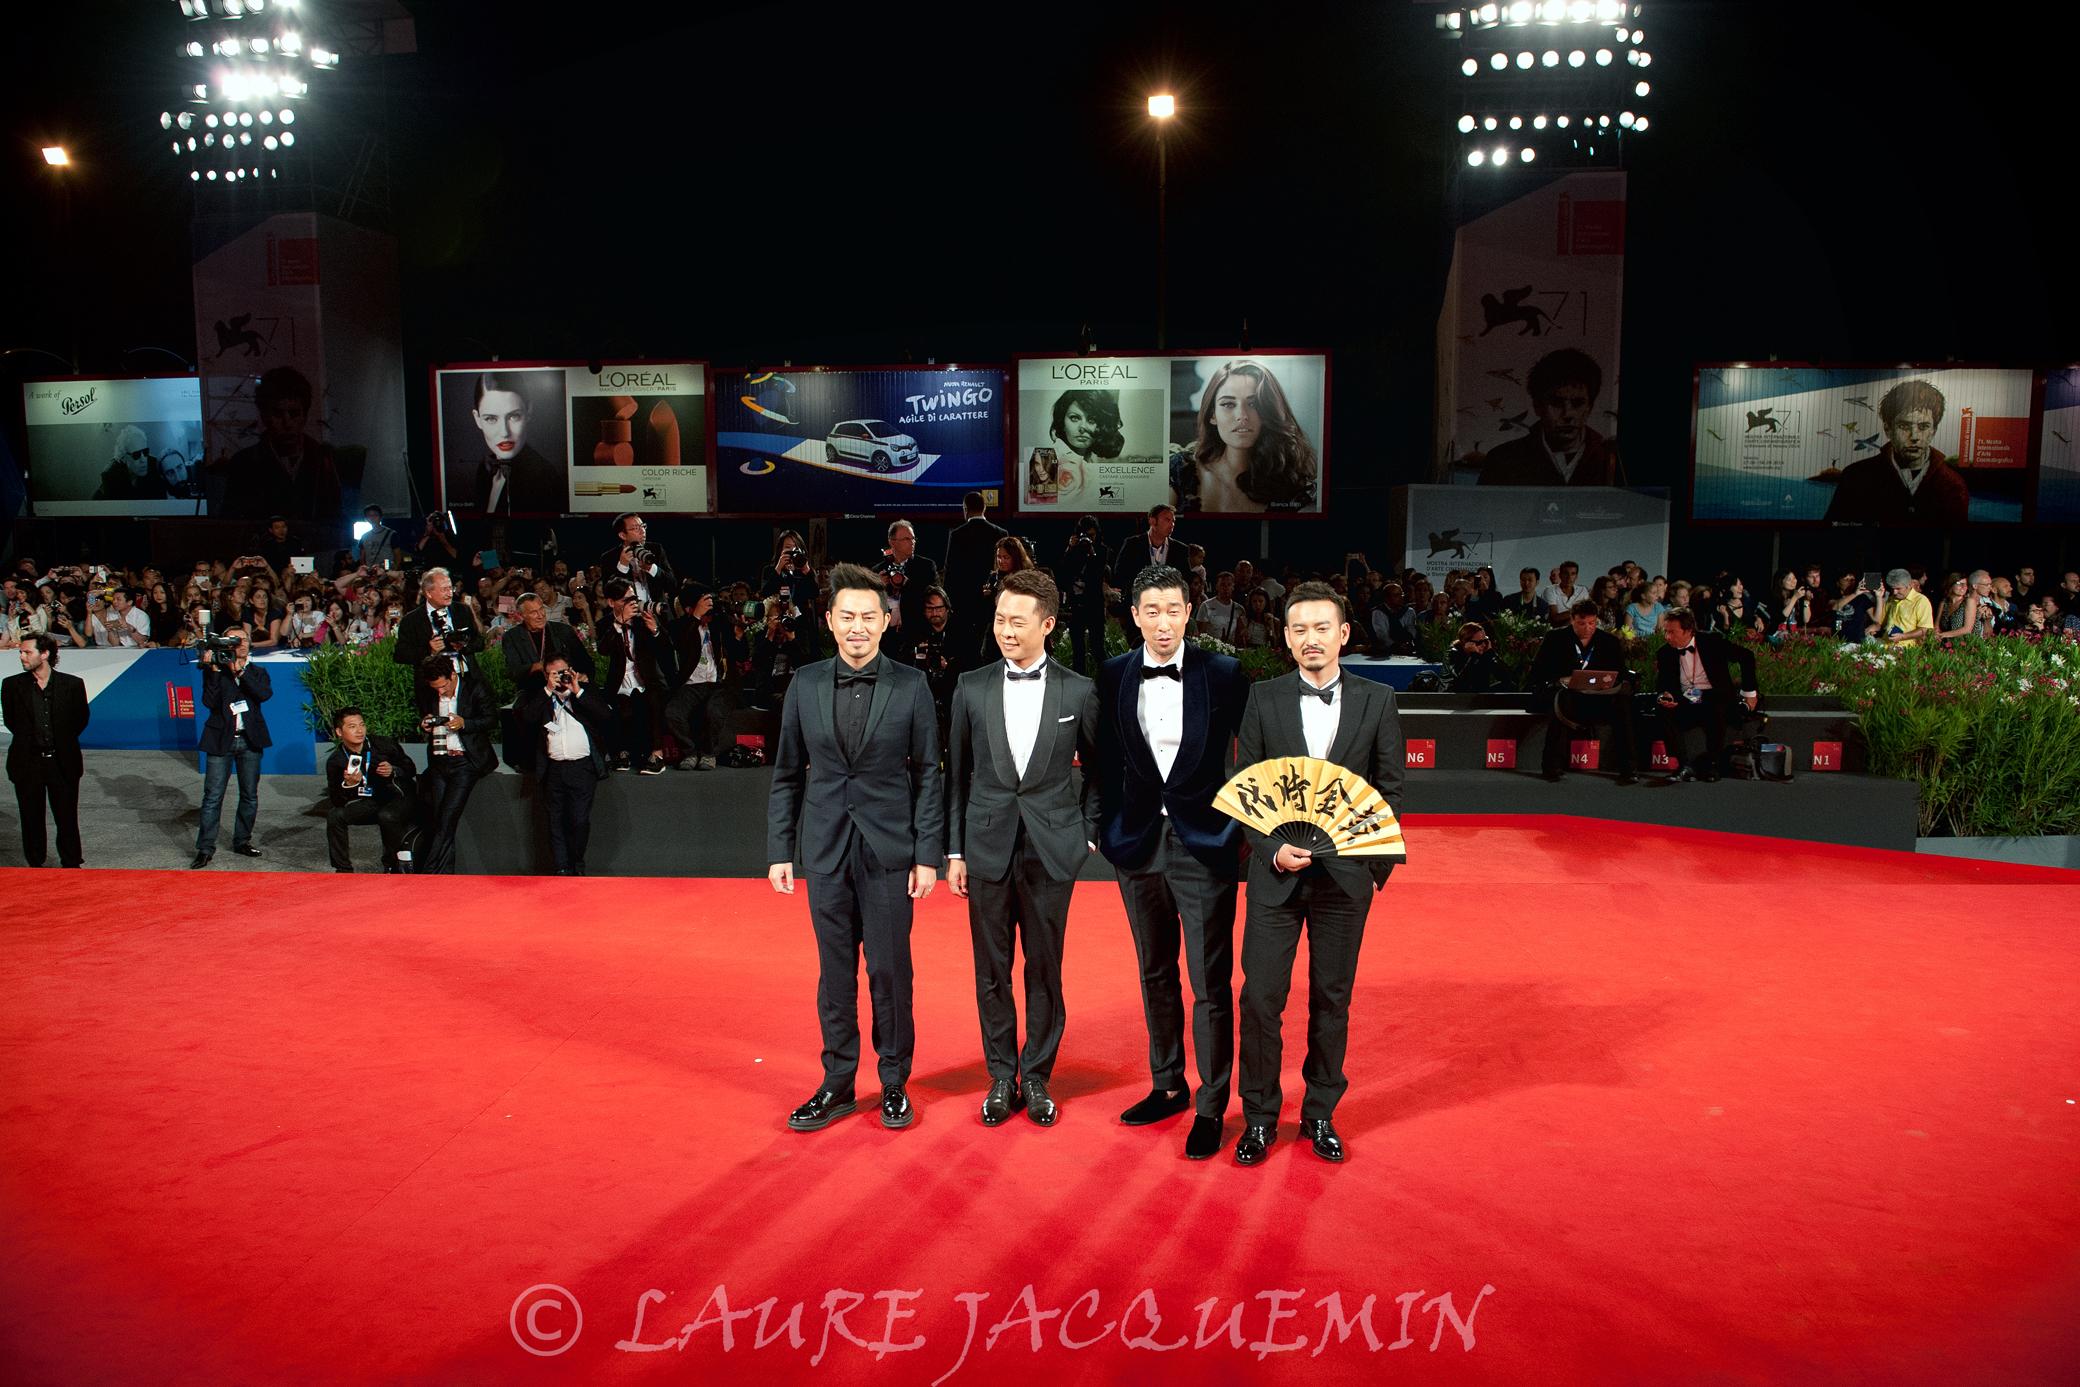 venice film festival venice laure jacquemin (4).jpg